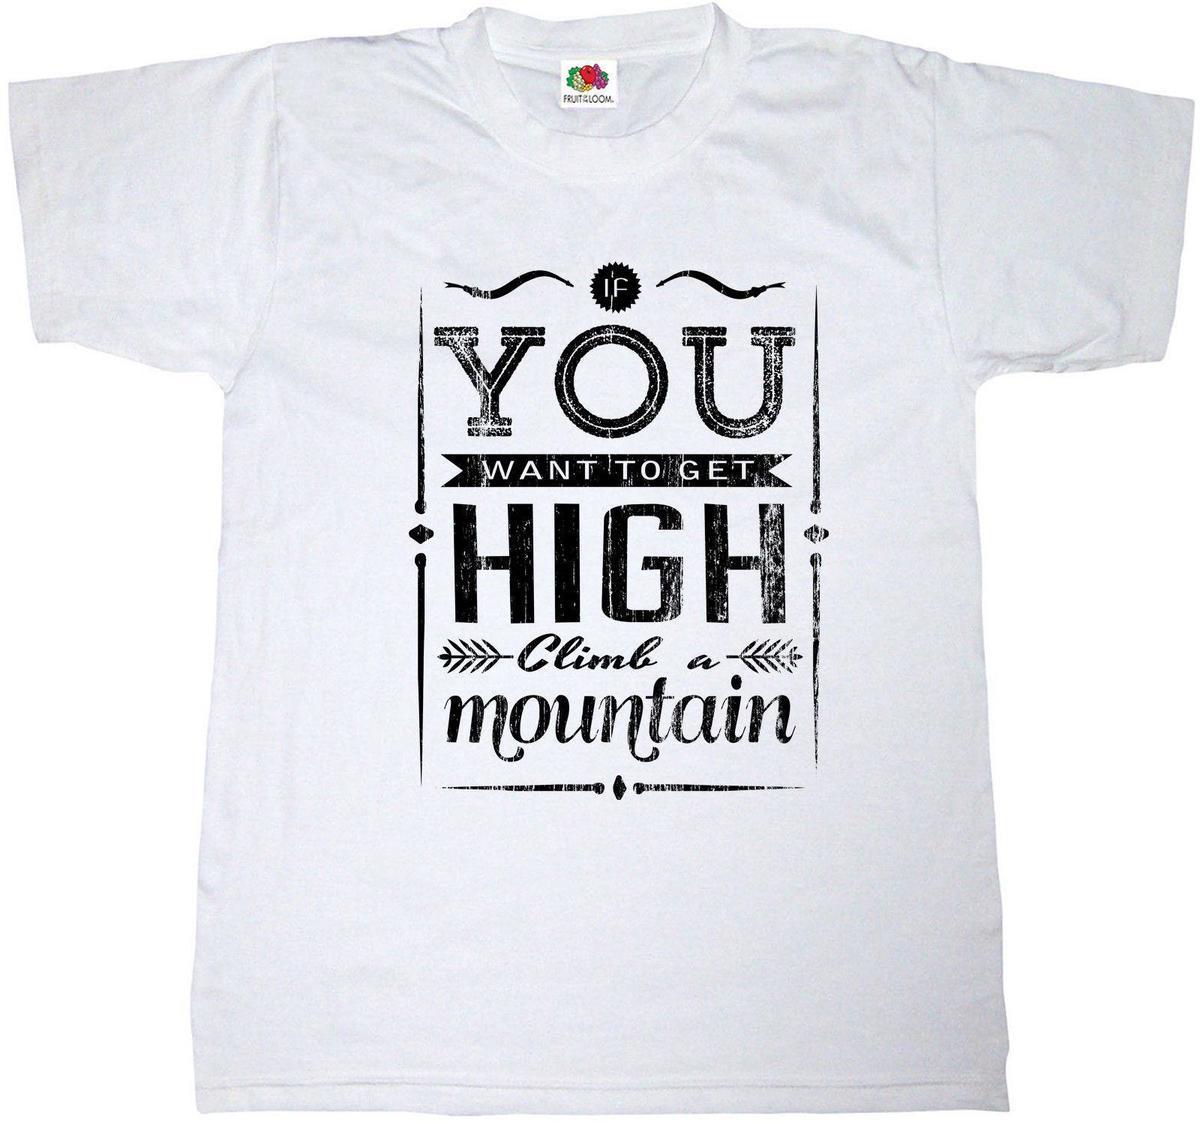 ed54258d785 MOUNTAIN ROCK CLIMBING FUNNY T SHIRT IF YOU WANT TO GET HIGH HIKING TEE  SHIRT Tee T Shirt NEW ARRIVAL Designer Shirts White Shirts From Jie49